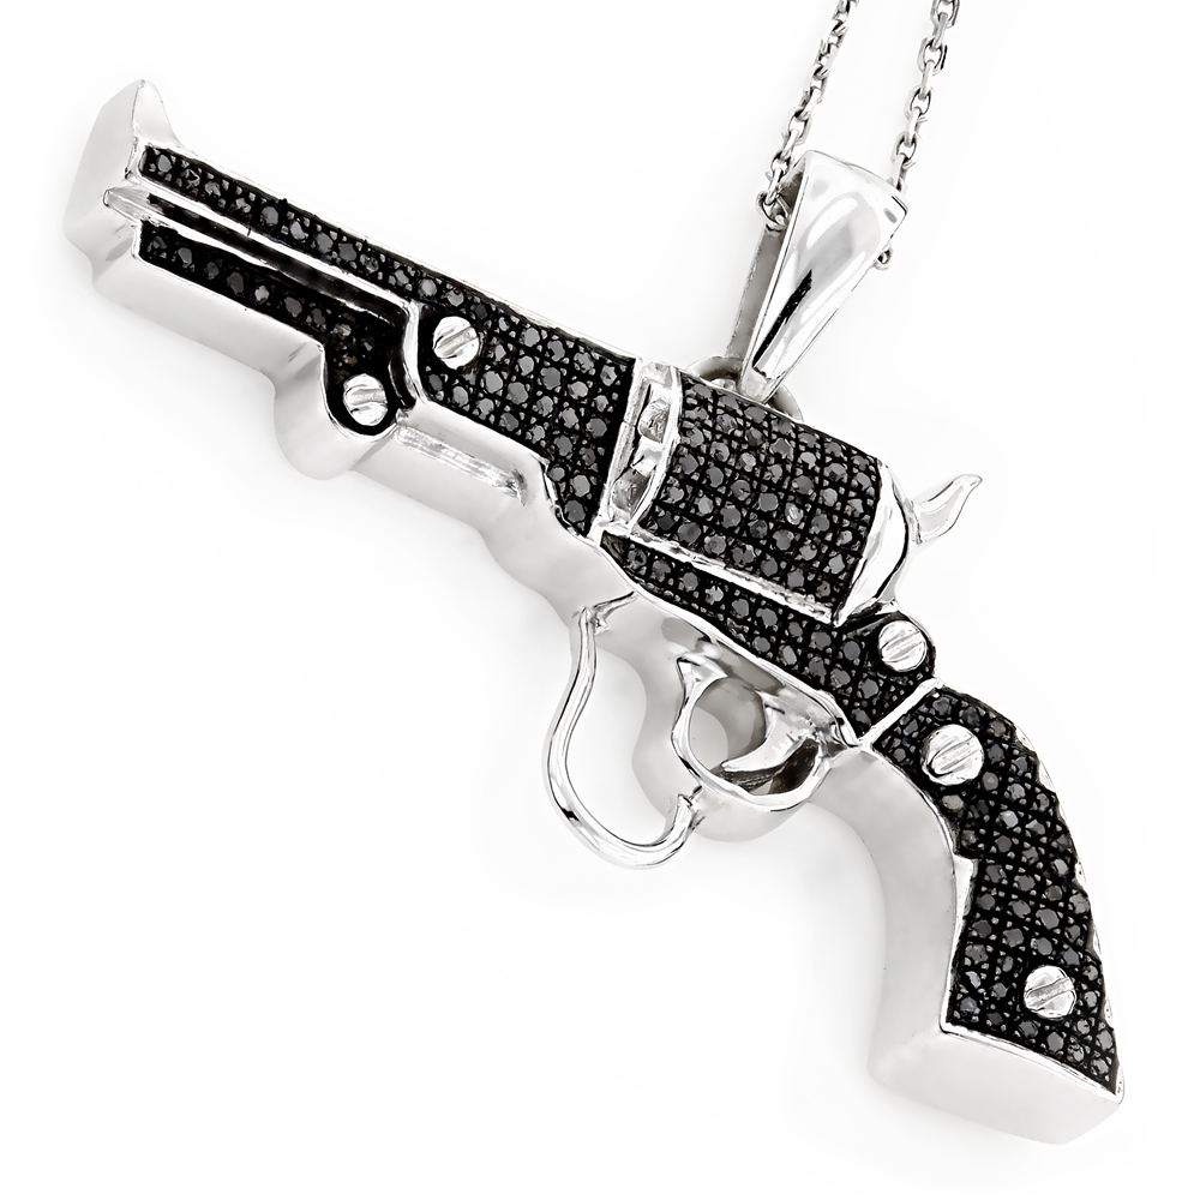 Black Diamond Jewelry: Sterling Silver Gun Pendant .9ct